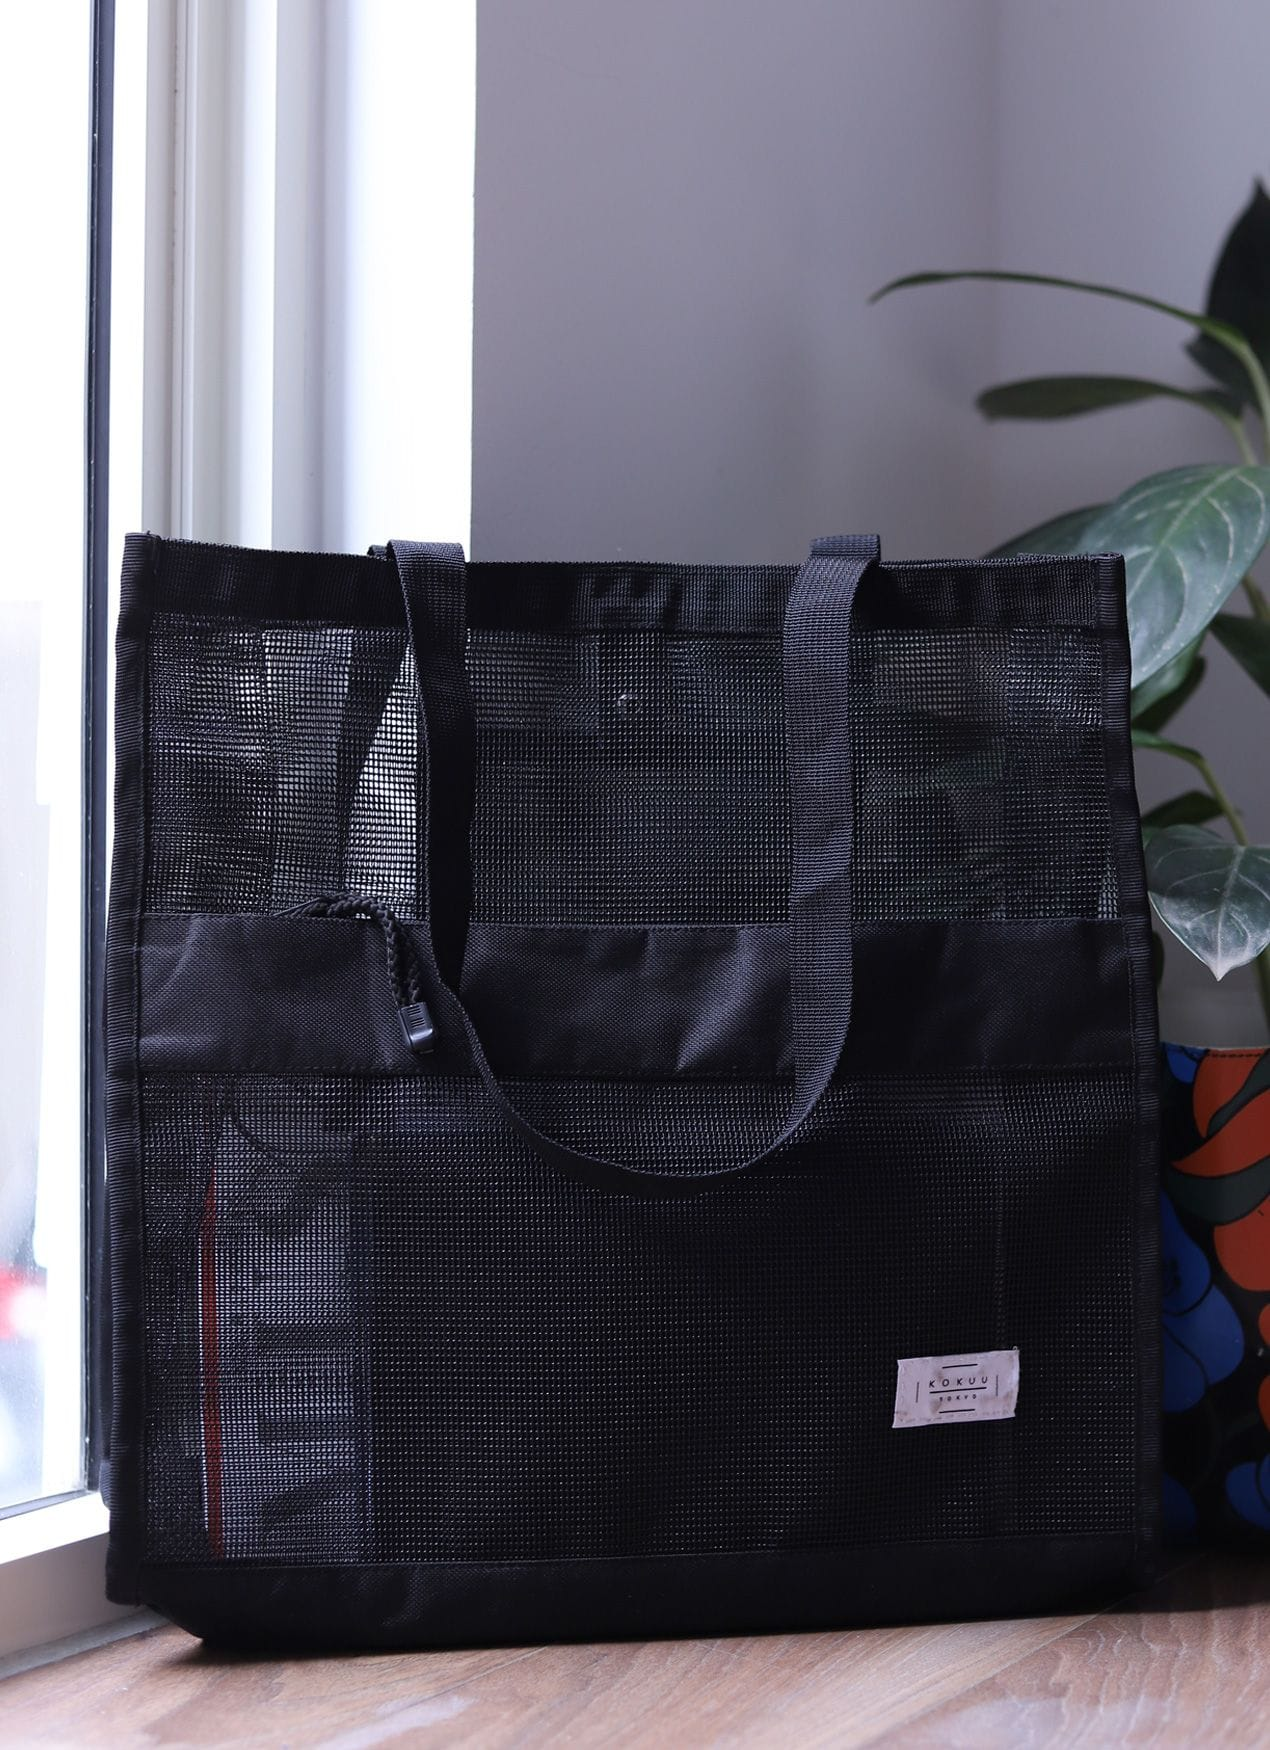 #PopbelaOOTD: Rekomendasi Tas Keren Sebagai Ganti Kantong Plastik